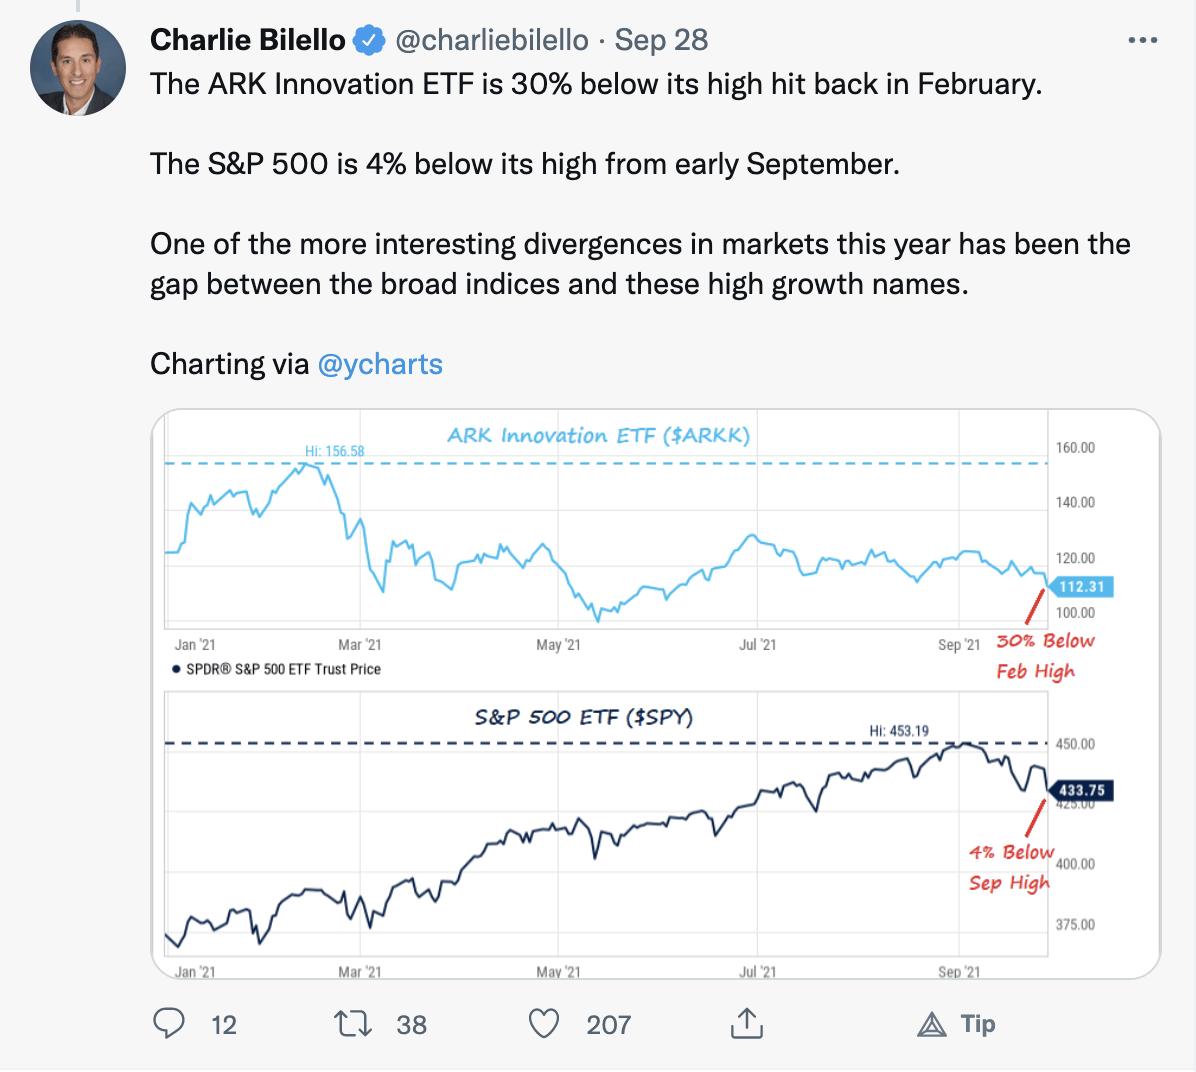 Charlie Bilello Tweet